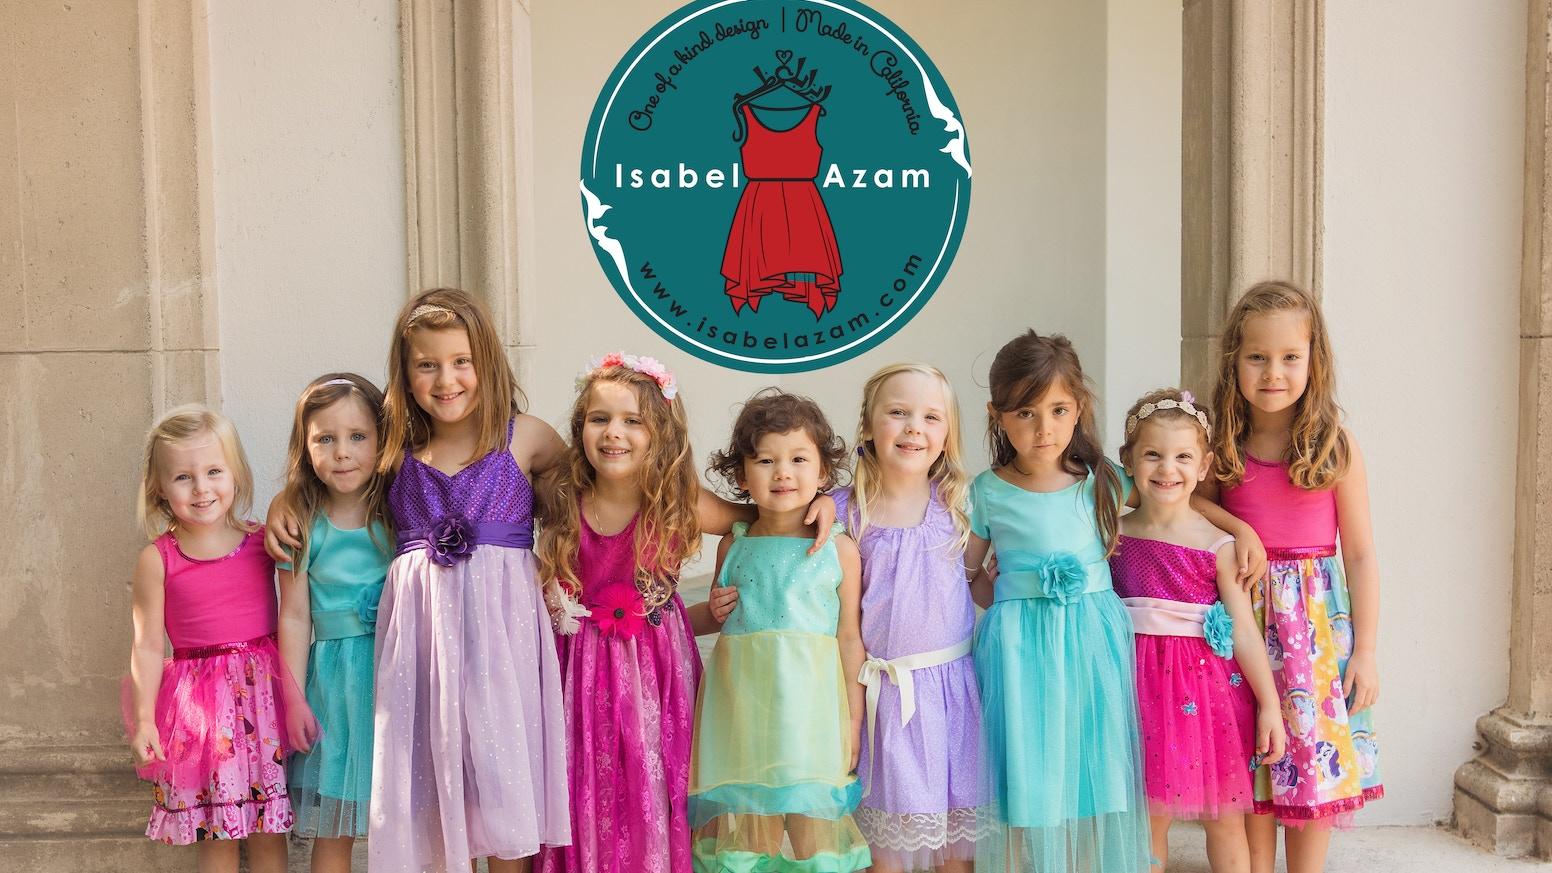 Isabel Azam Customizable Dress By Jaleh Naasz New Reward Fashion Day Camp In Lamorinda Kickstarter